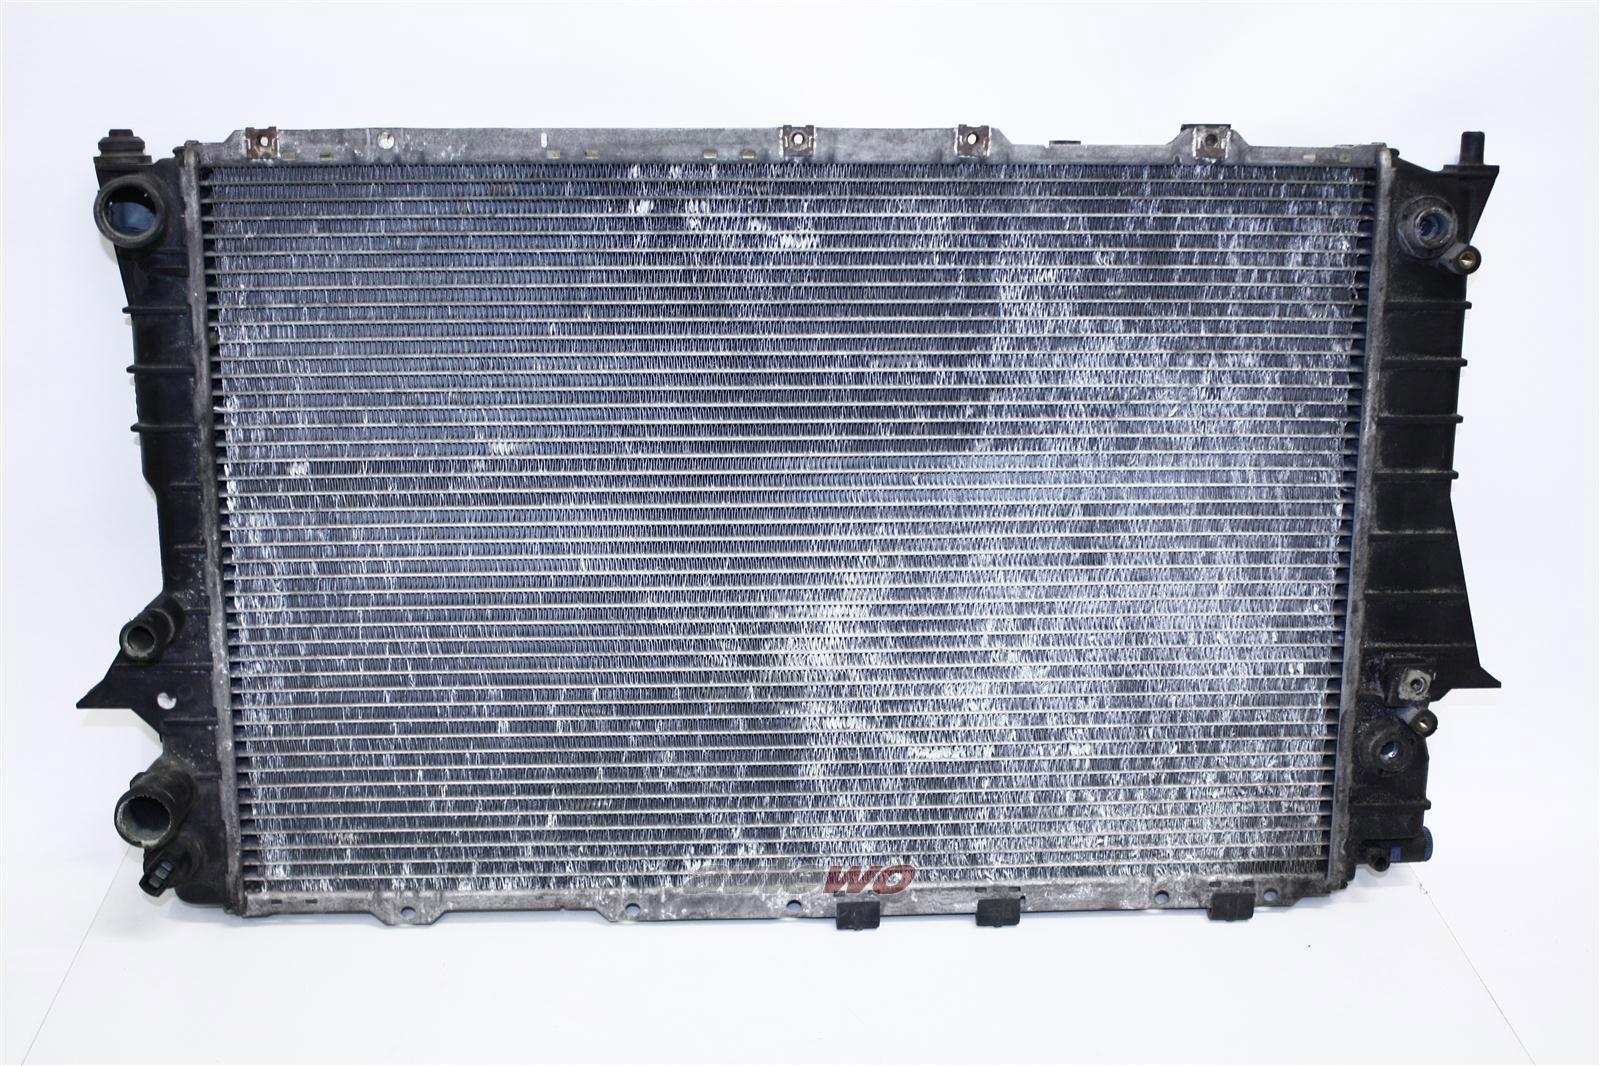 Audi 100/A6 C4 1.9/2.5l Wasserkühler + Ölkühler Automatik 4A0121251C